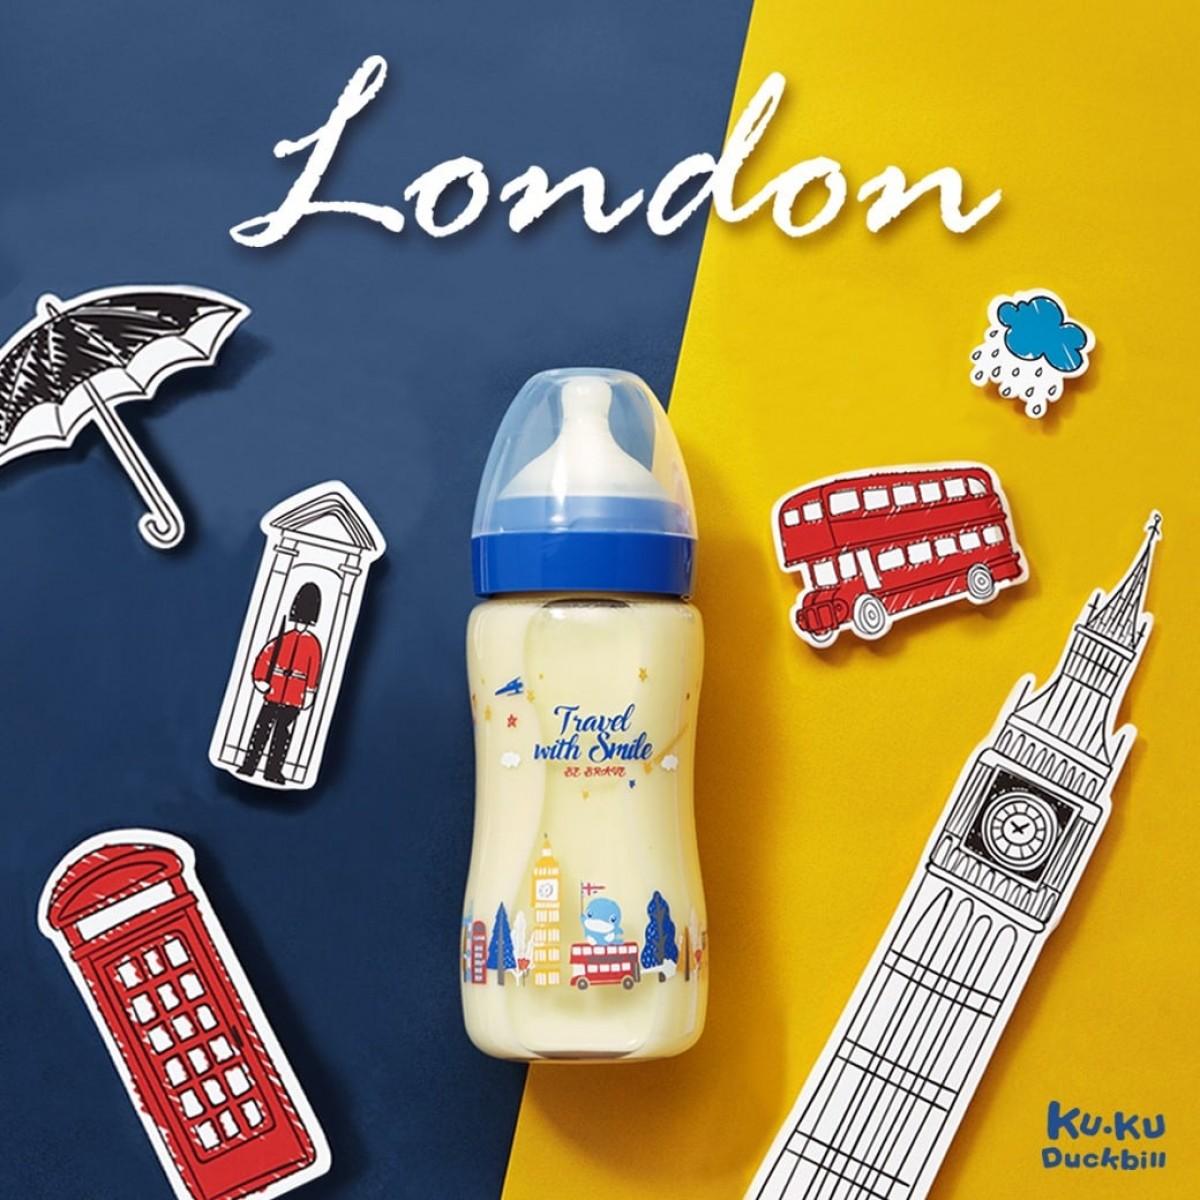 Kuku Duckbill Travel with Smile PPSU Wide Neck Feeding Bottle France / London: S+Cross-Cut